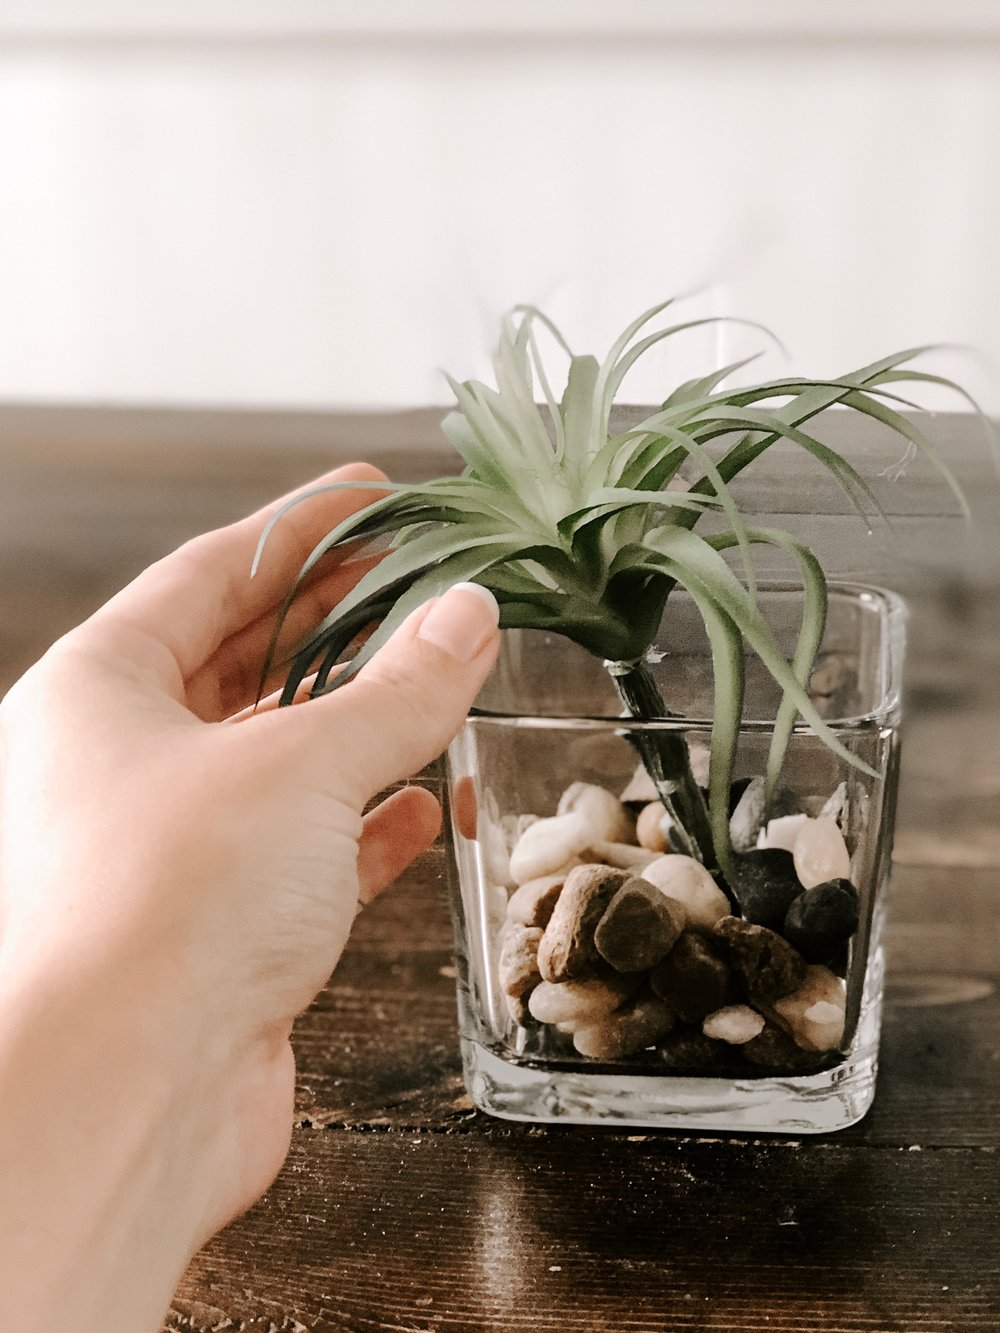 Add succulent to jar